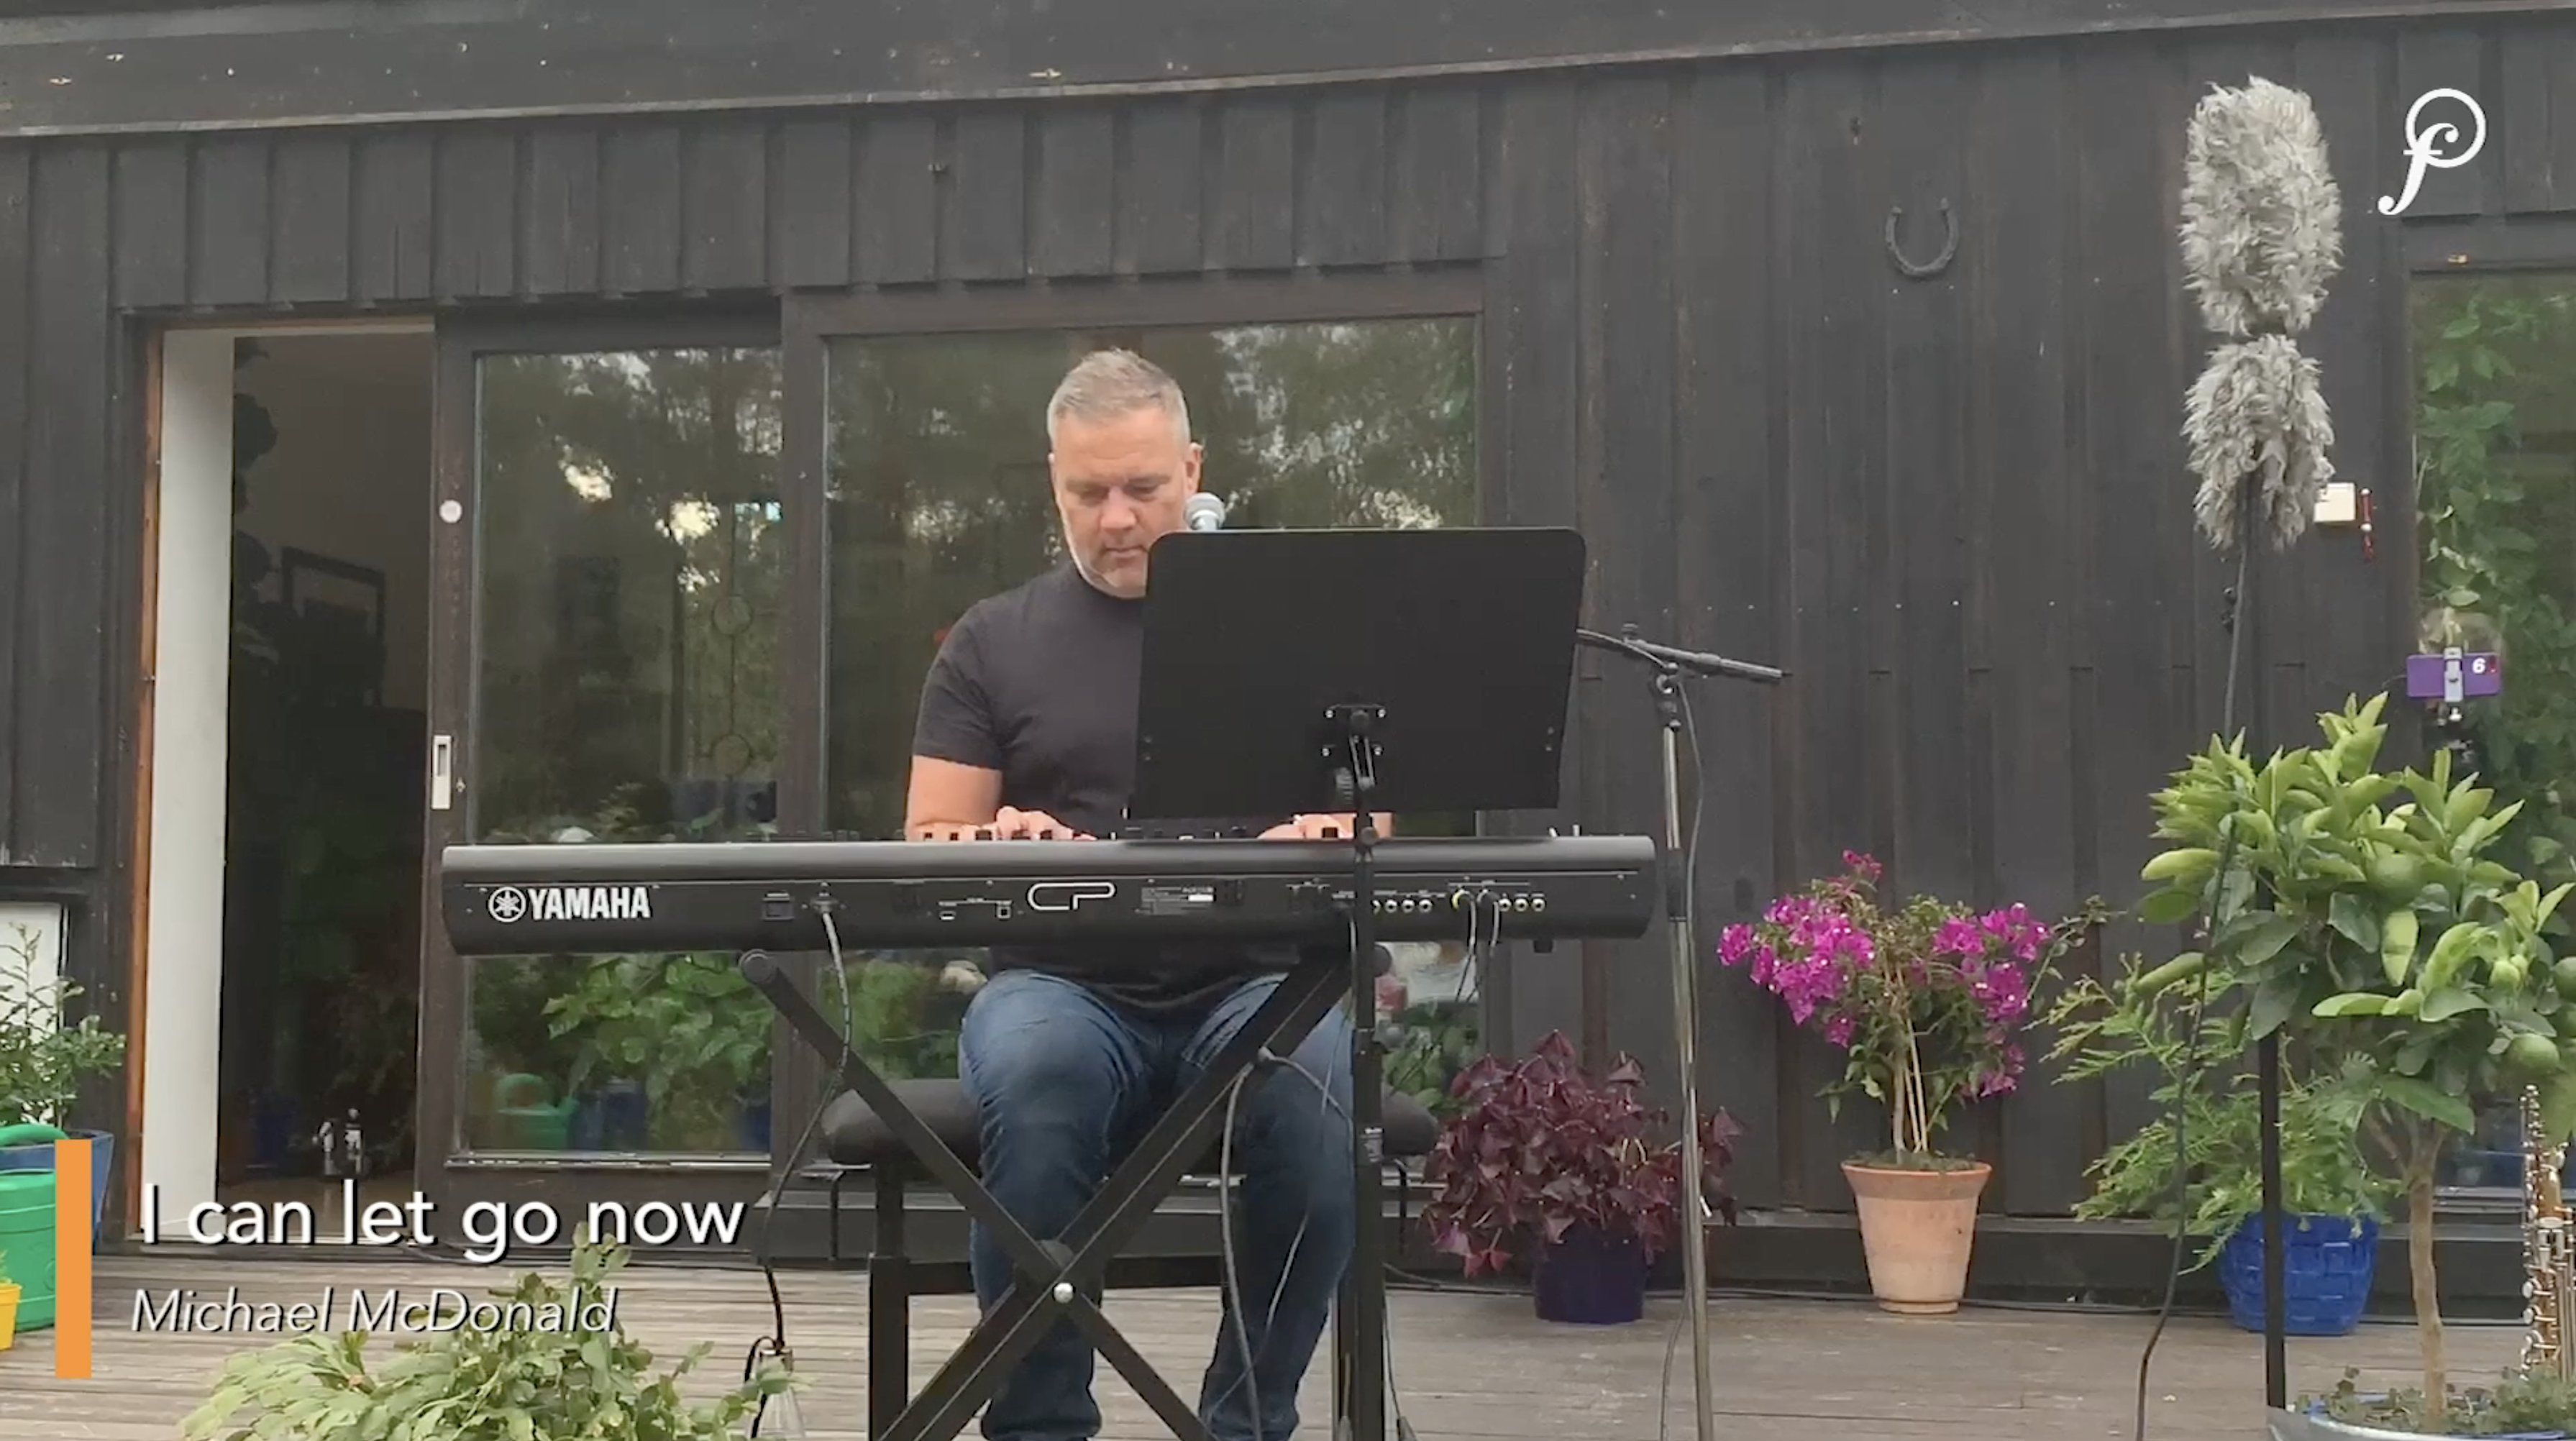 Livestream Andreas Aleman